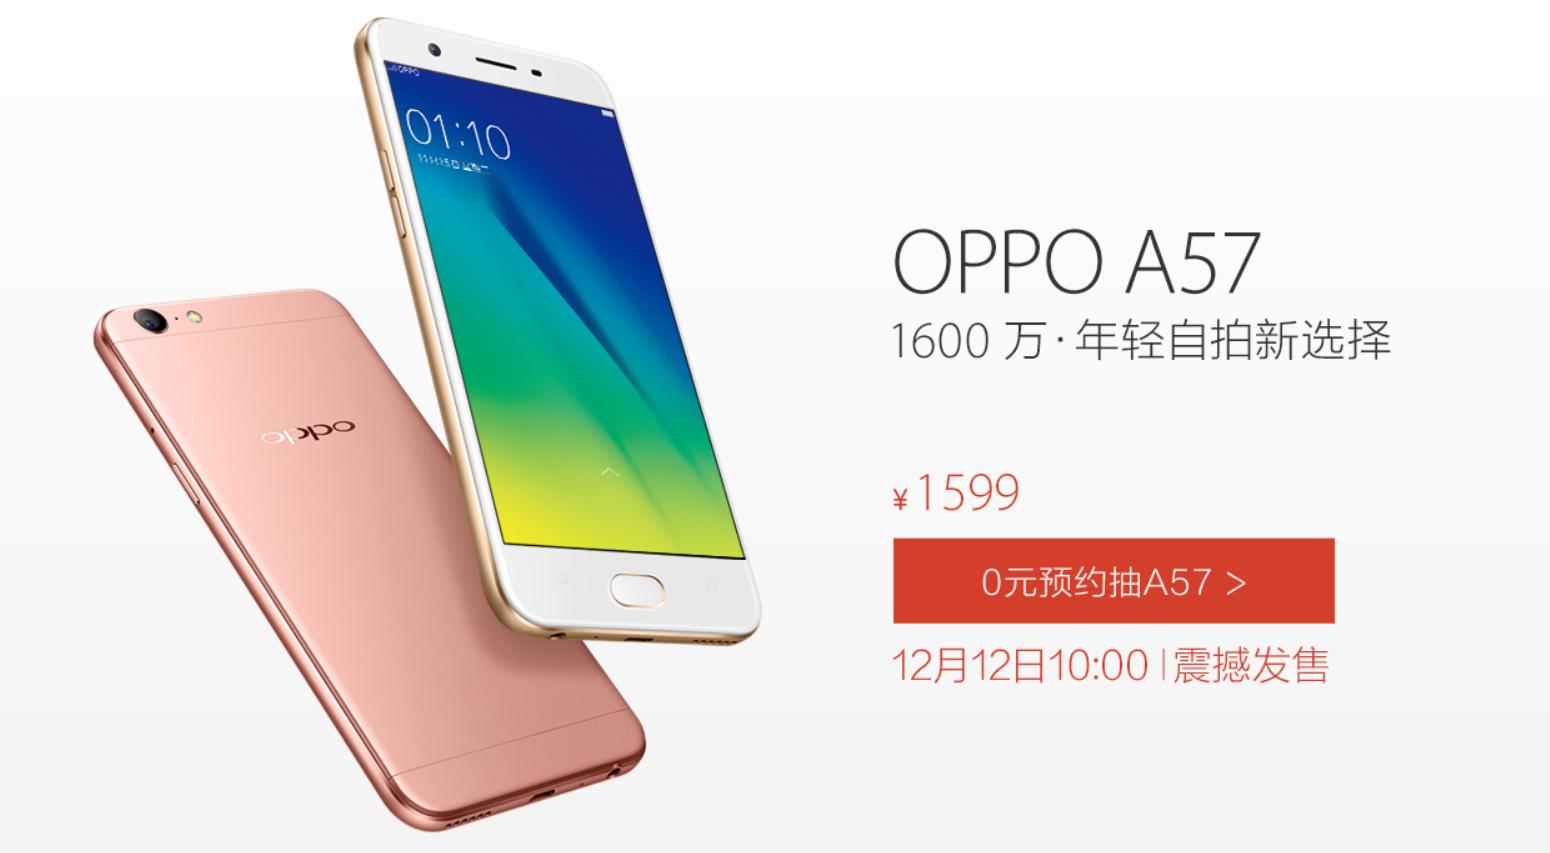 گوشی هوشمند Oppo A57